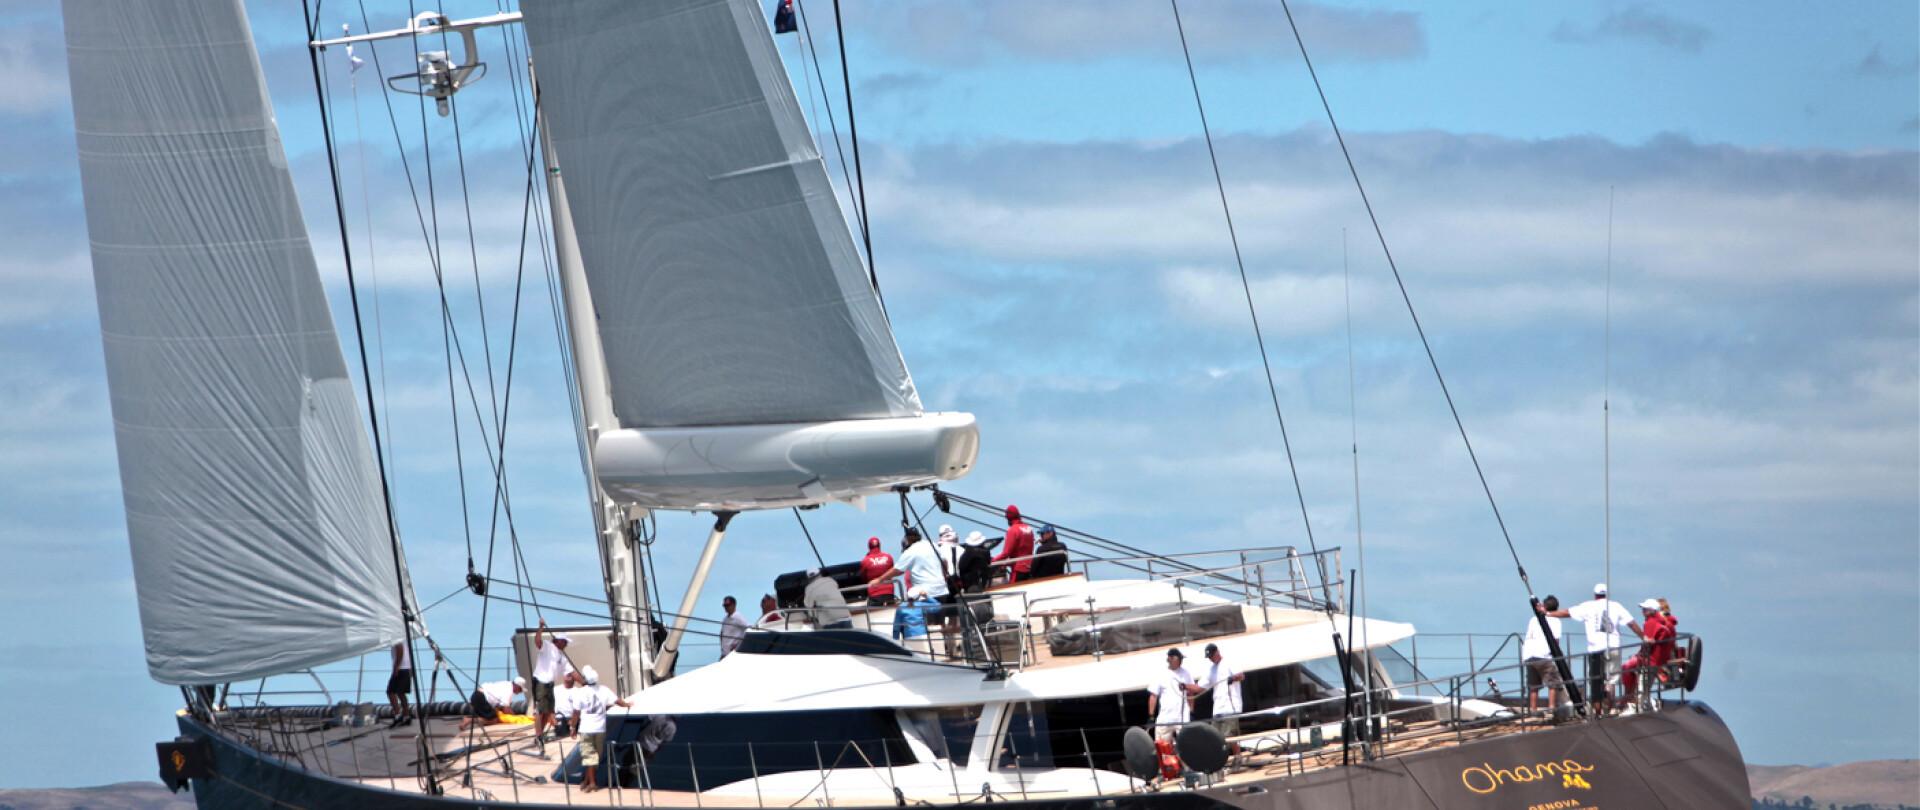 OHANA Yacht for Charter photo 5